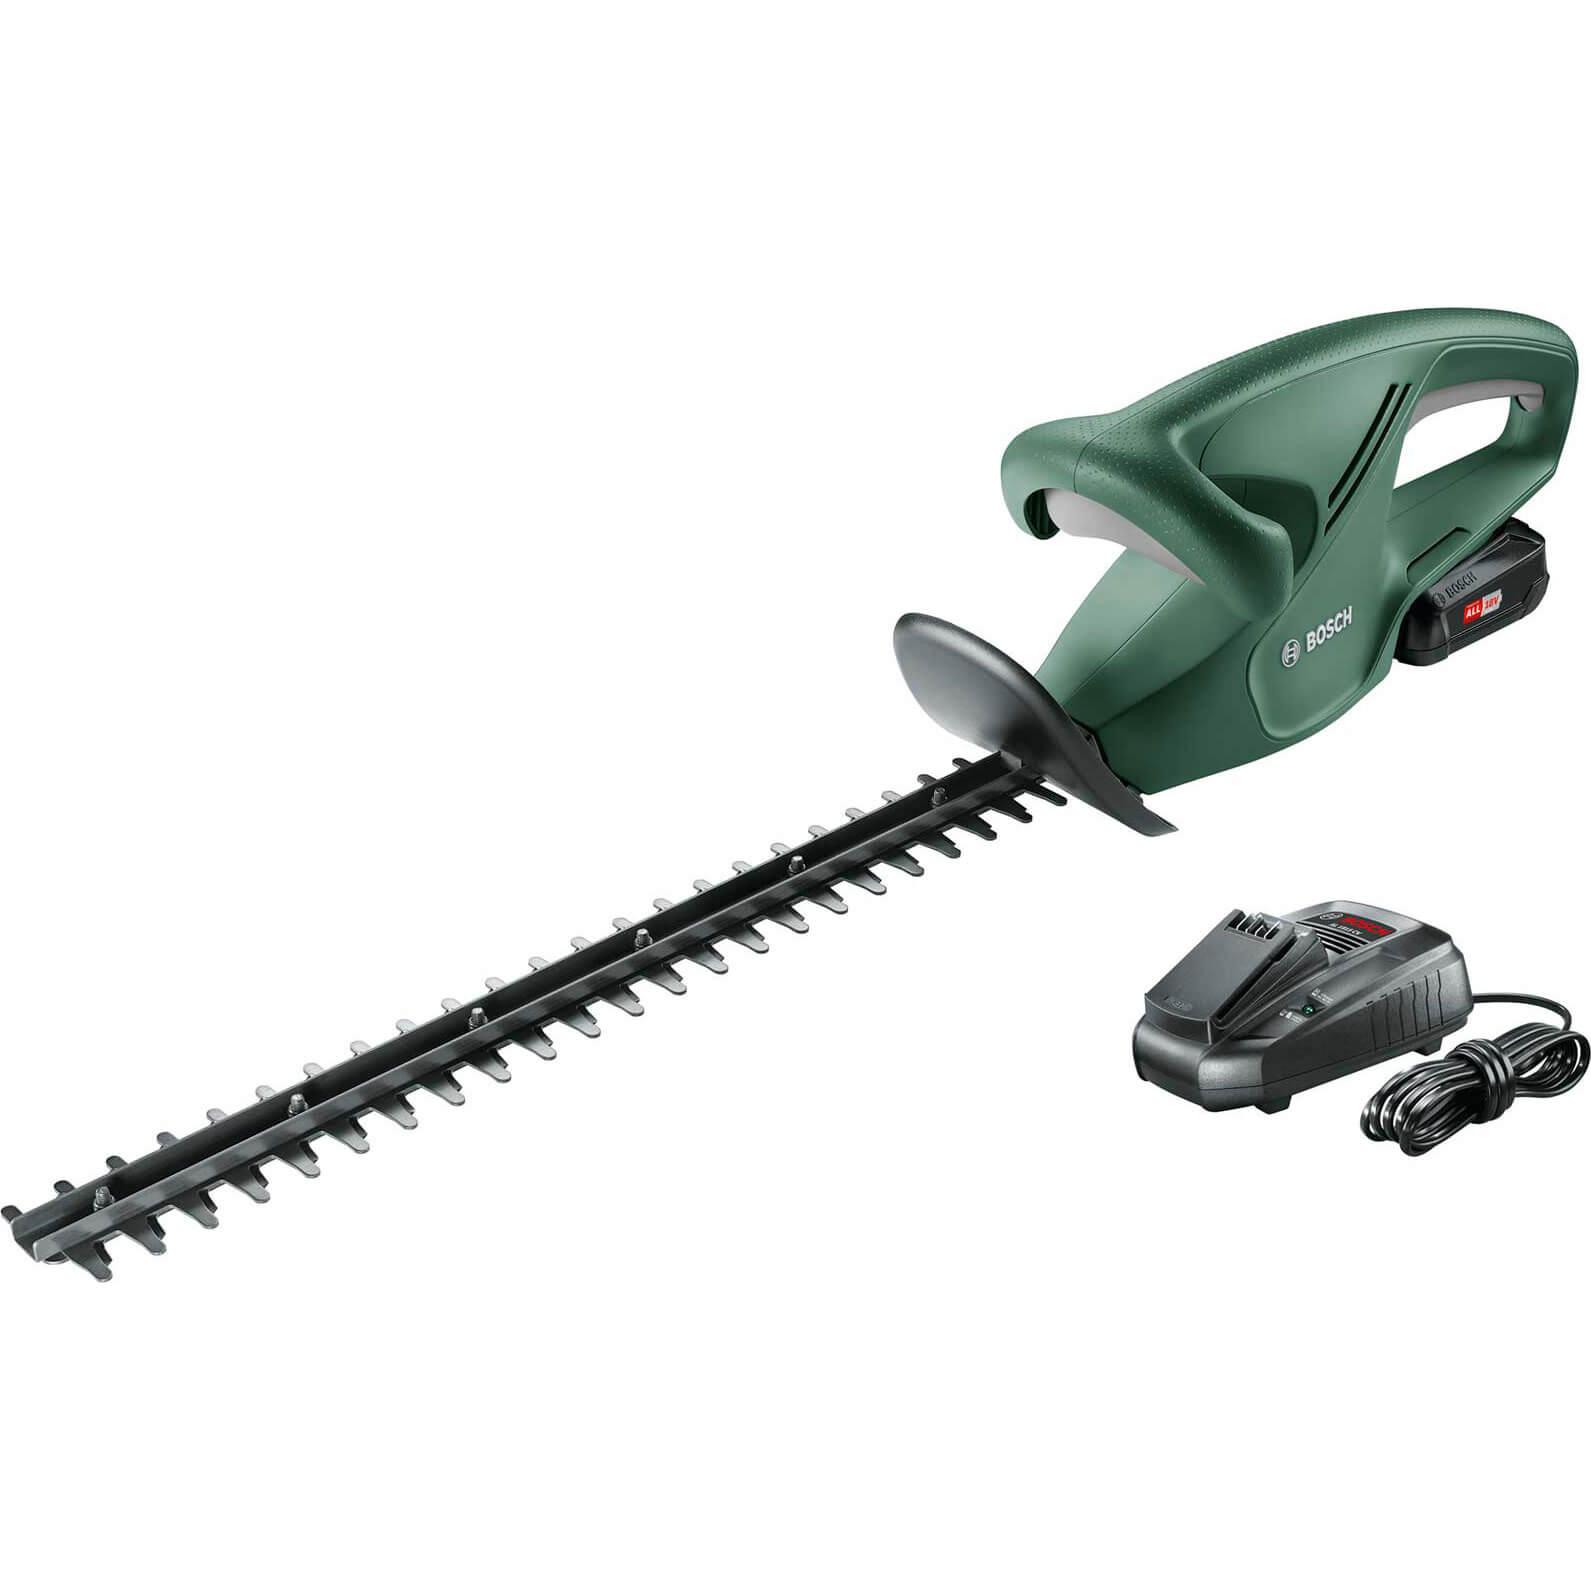 Bosch EASYHEDGECUT 18-45 18v Cordless Hedge Trimmer 450mm 1 x 2ah Li-ion Charger